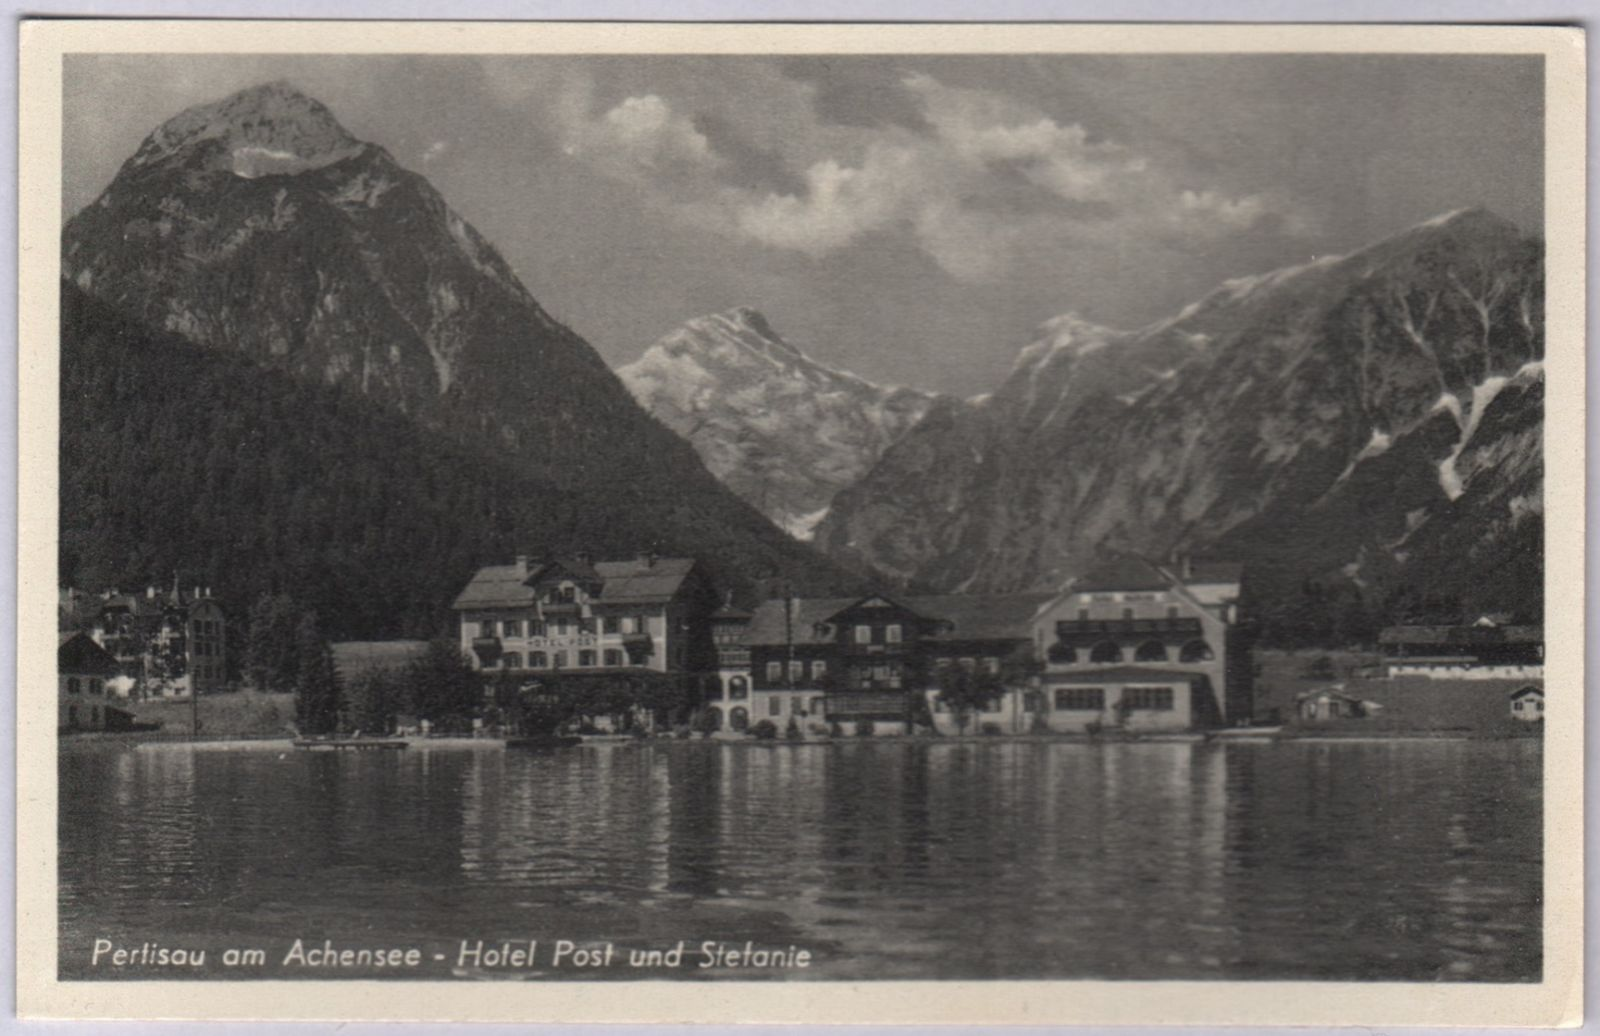 Pertisau Hotel Post & Stefanie